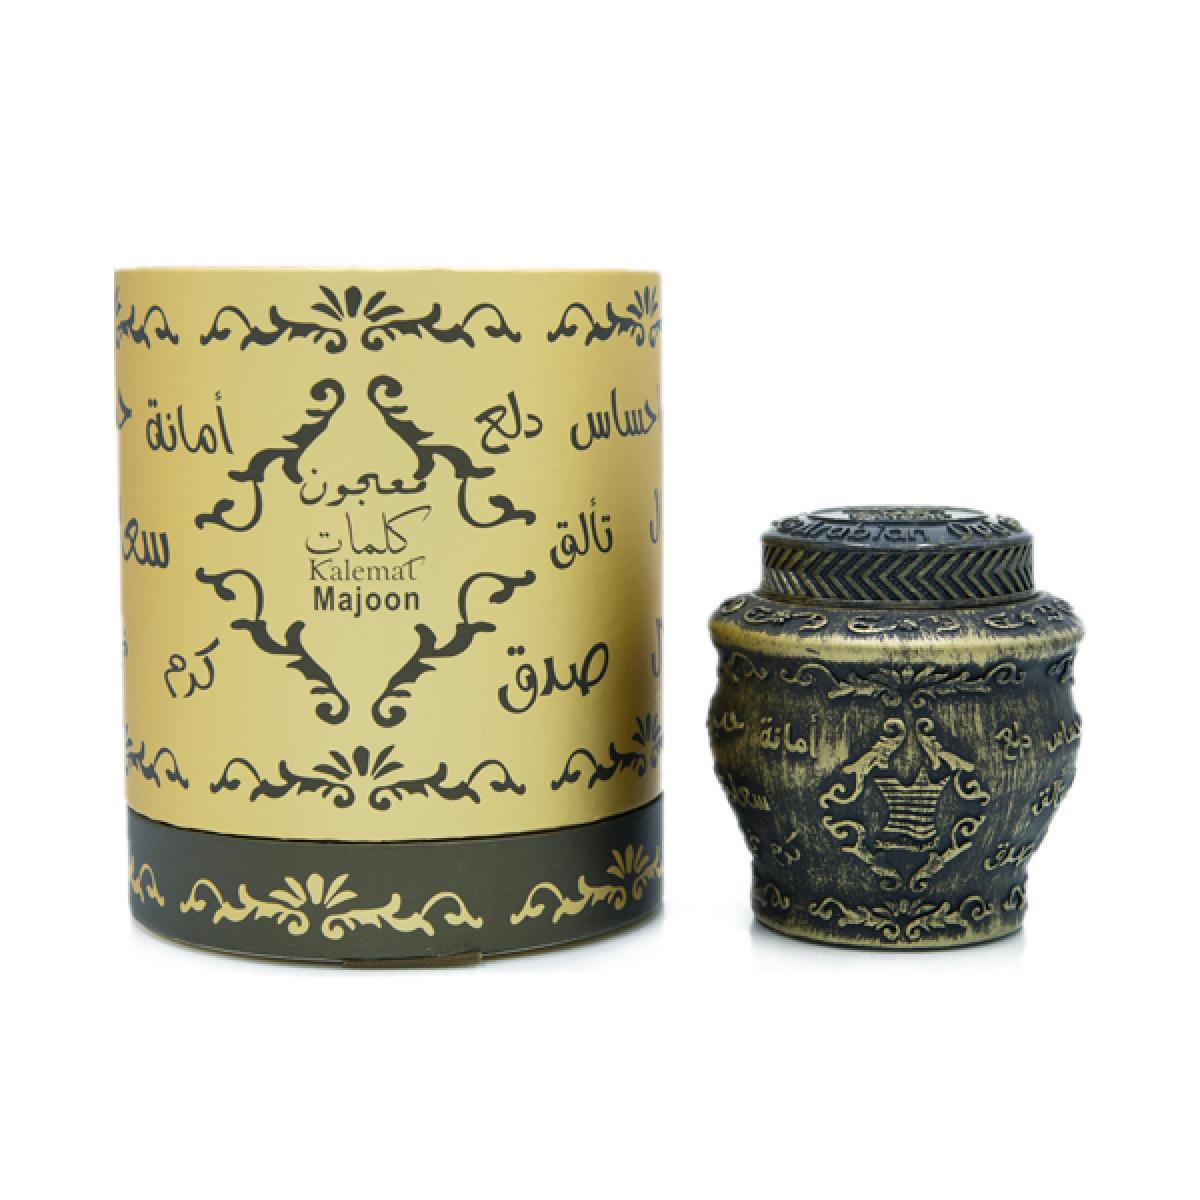 Maajoon Kalemat Encens par Arabian Oud 40 g-livraison gratuite Majon madjoun